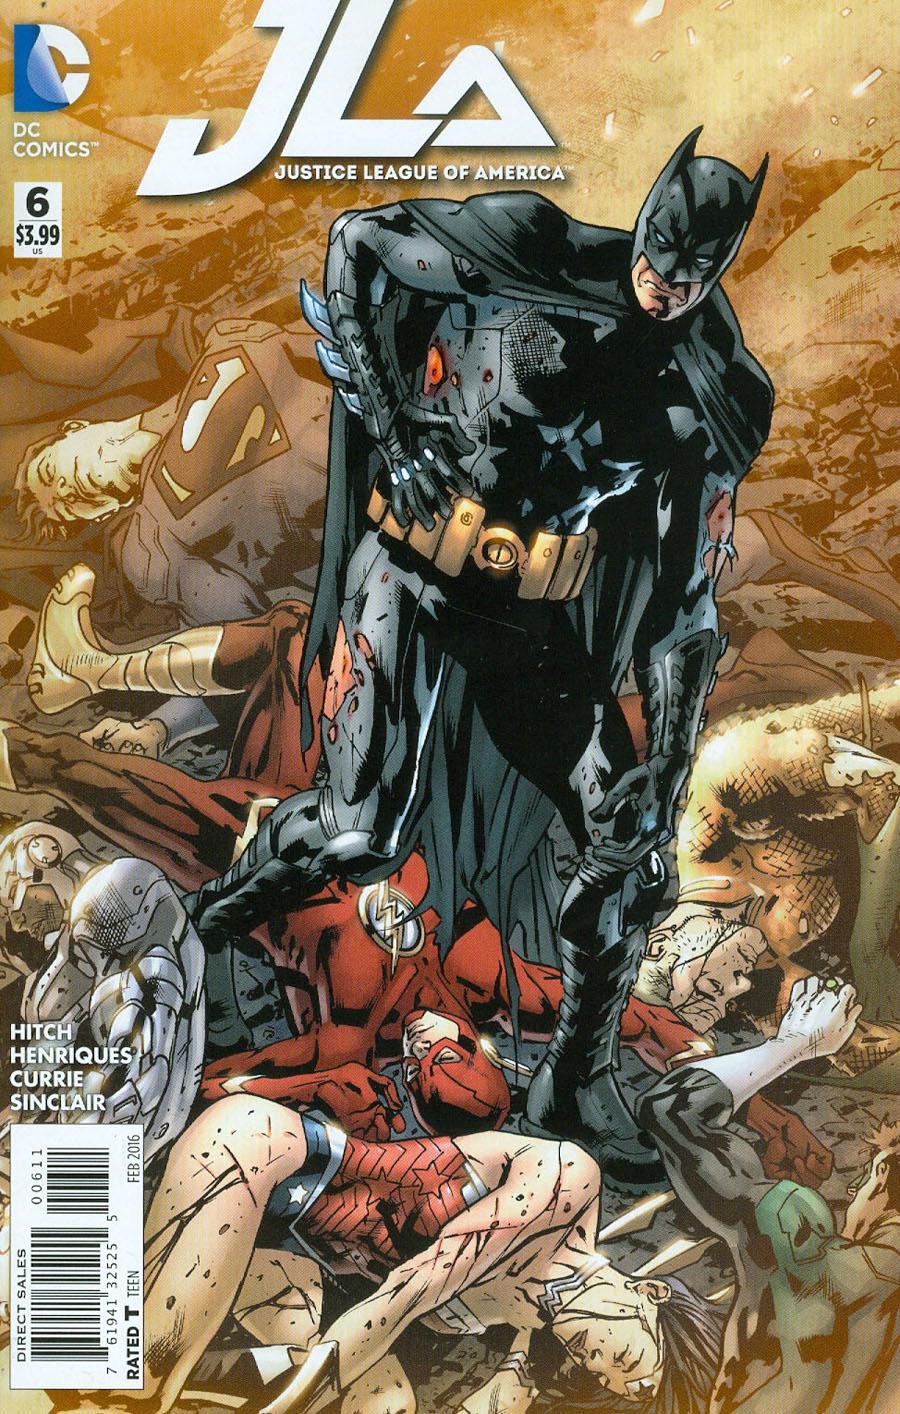 Justice League Of America Vol 4 #6 Cover A Regular Bryan Hitch Cover